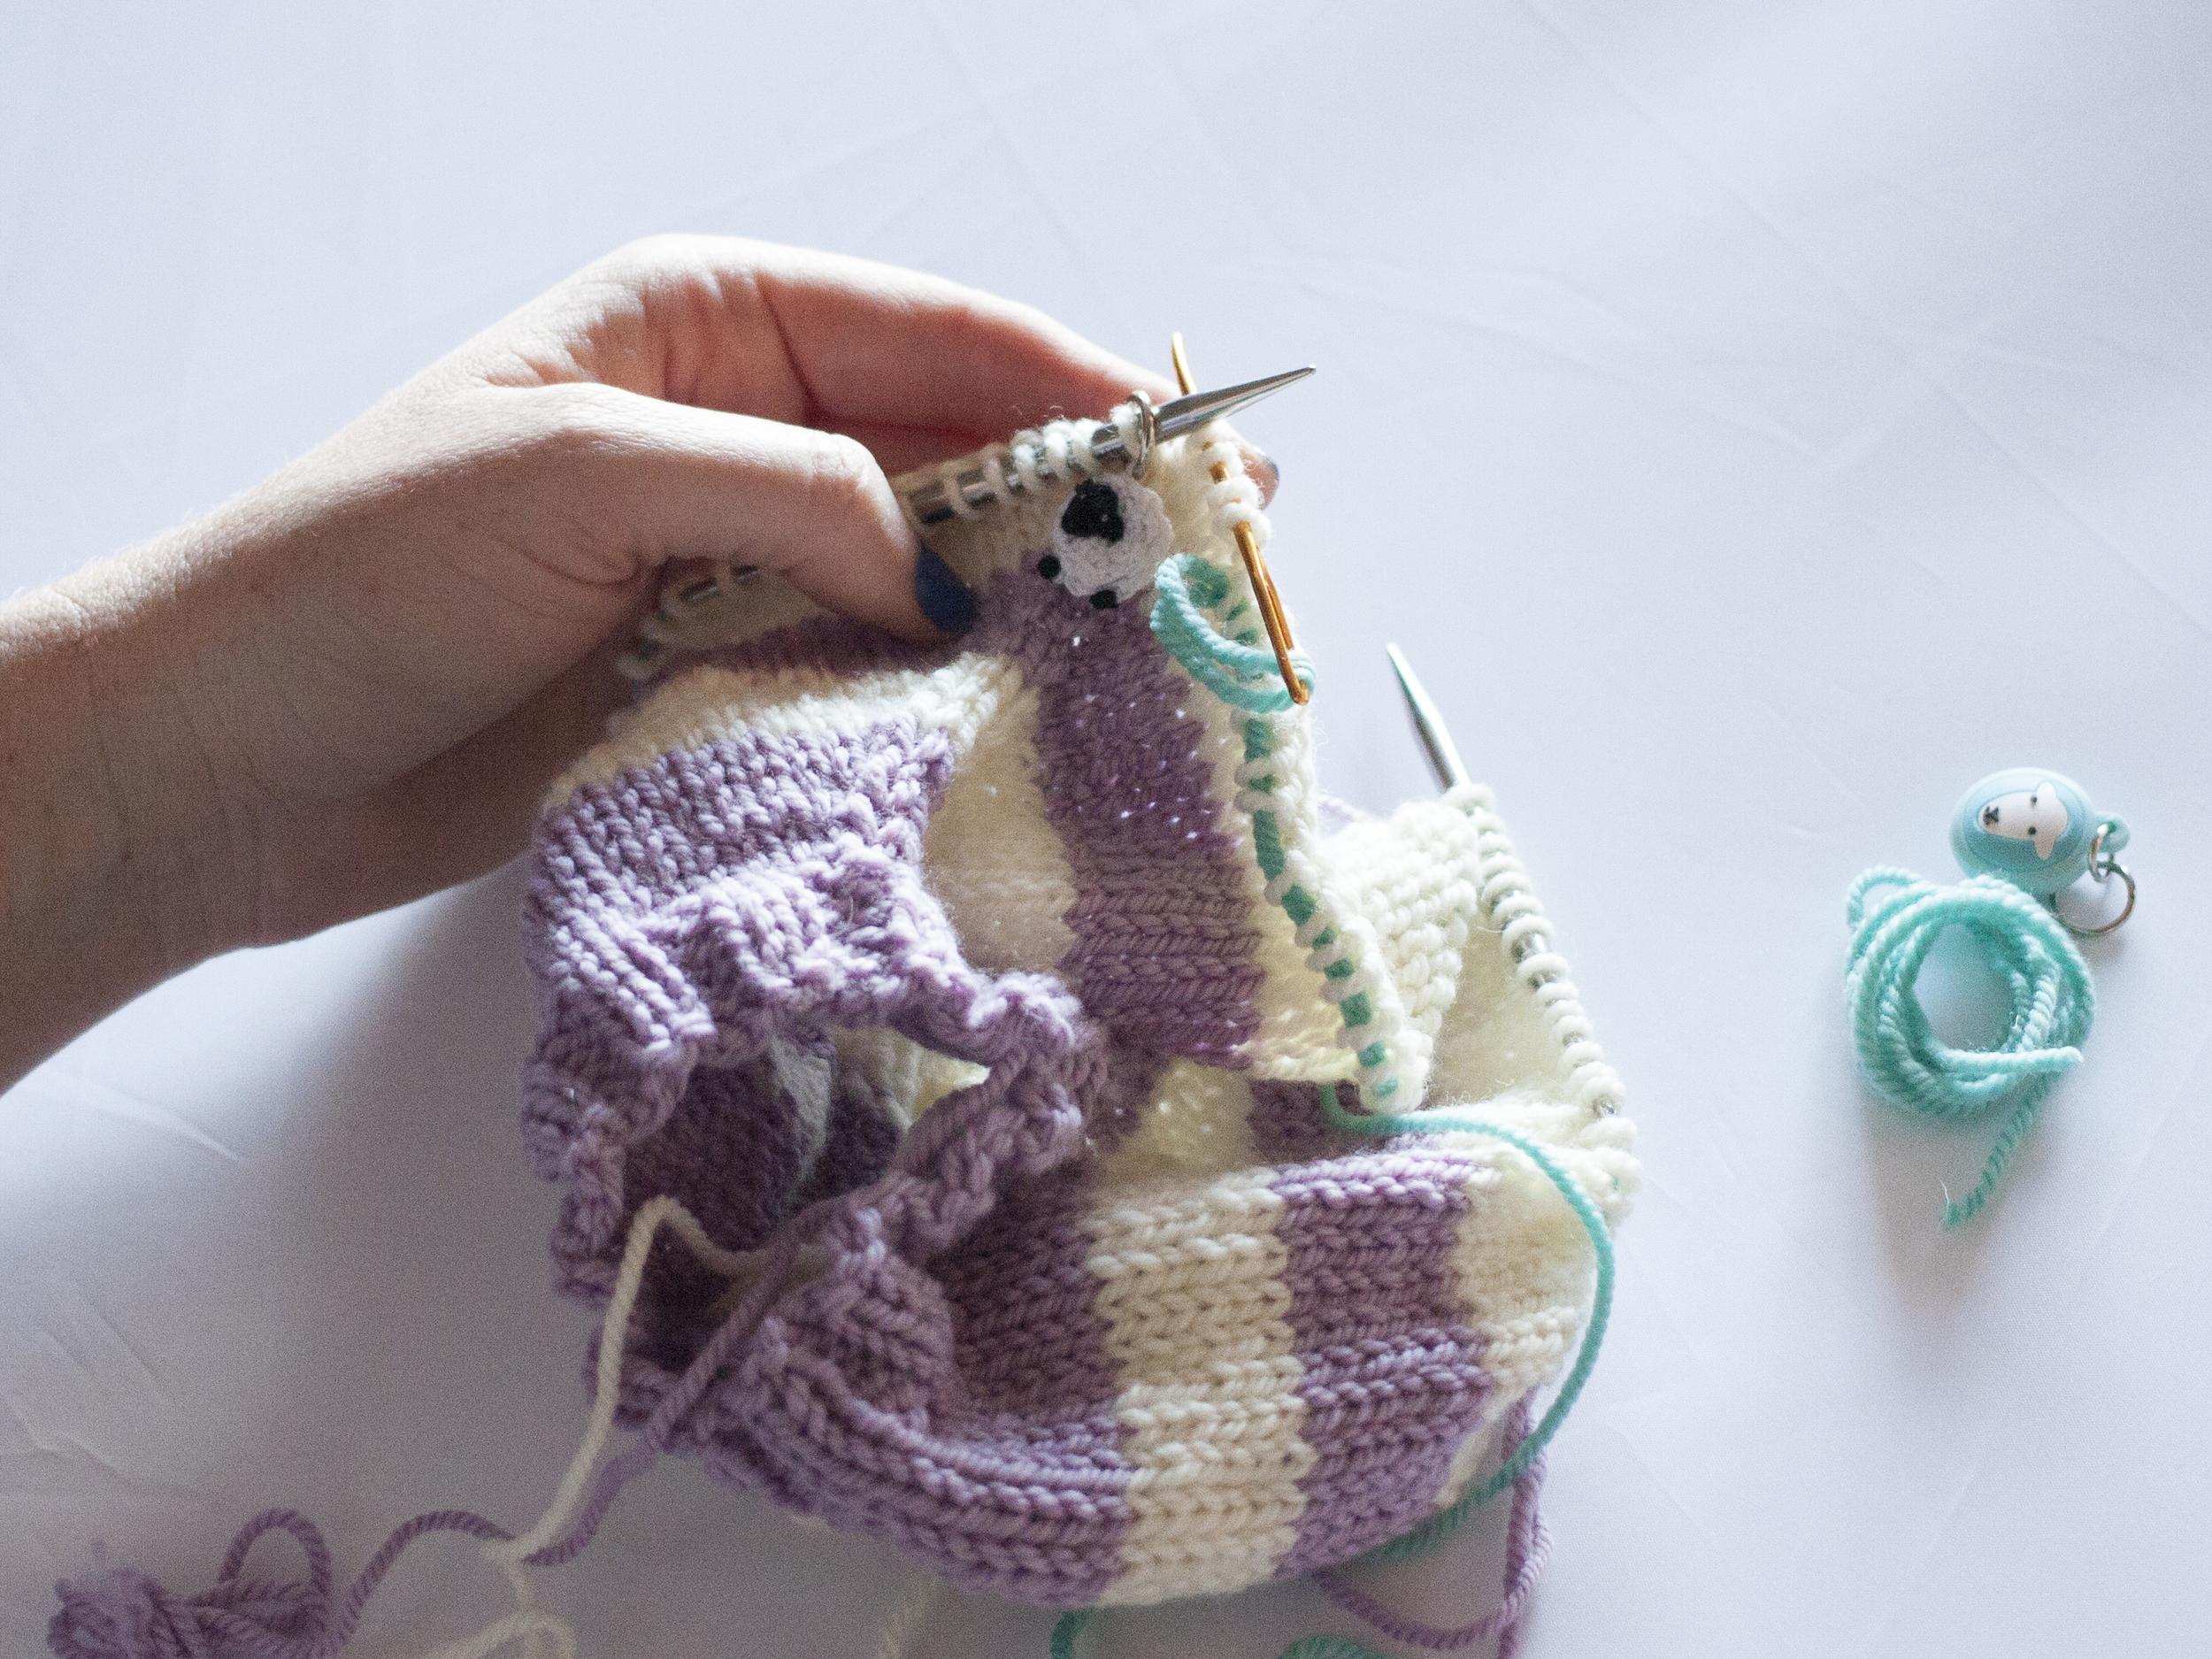 Placing stitches on a stitch holder